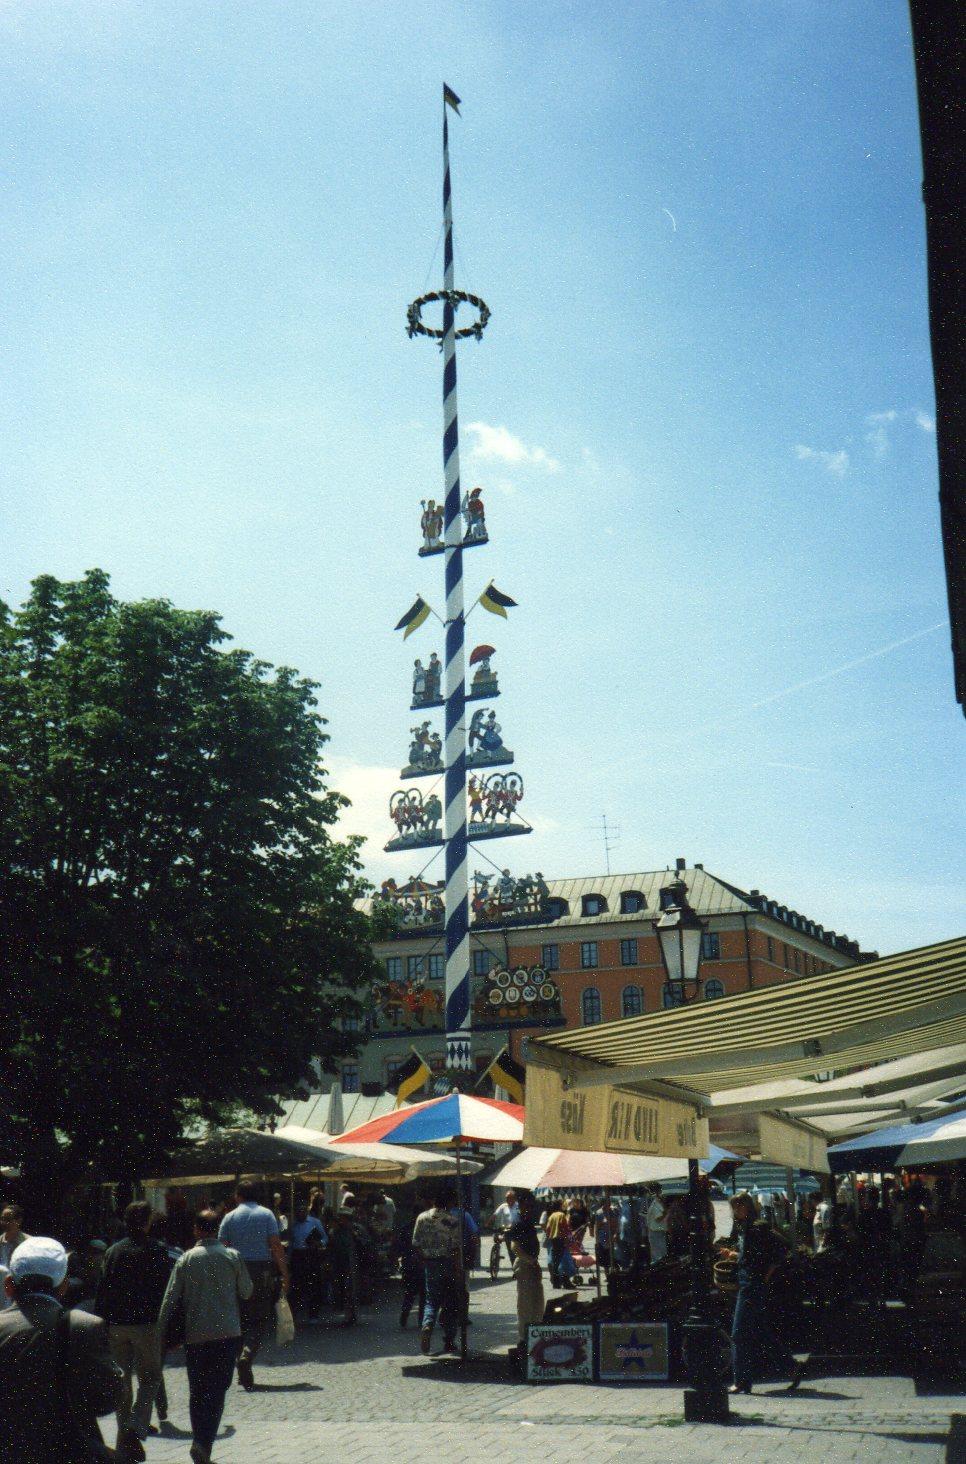 Maypole in Munich -